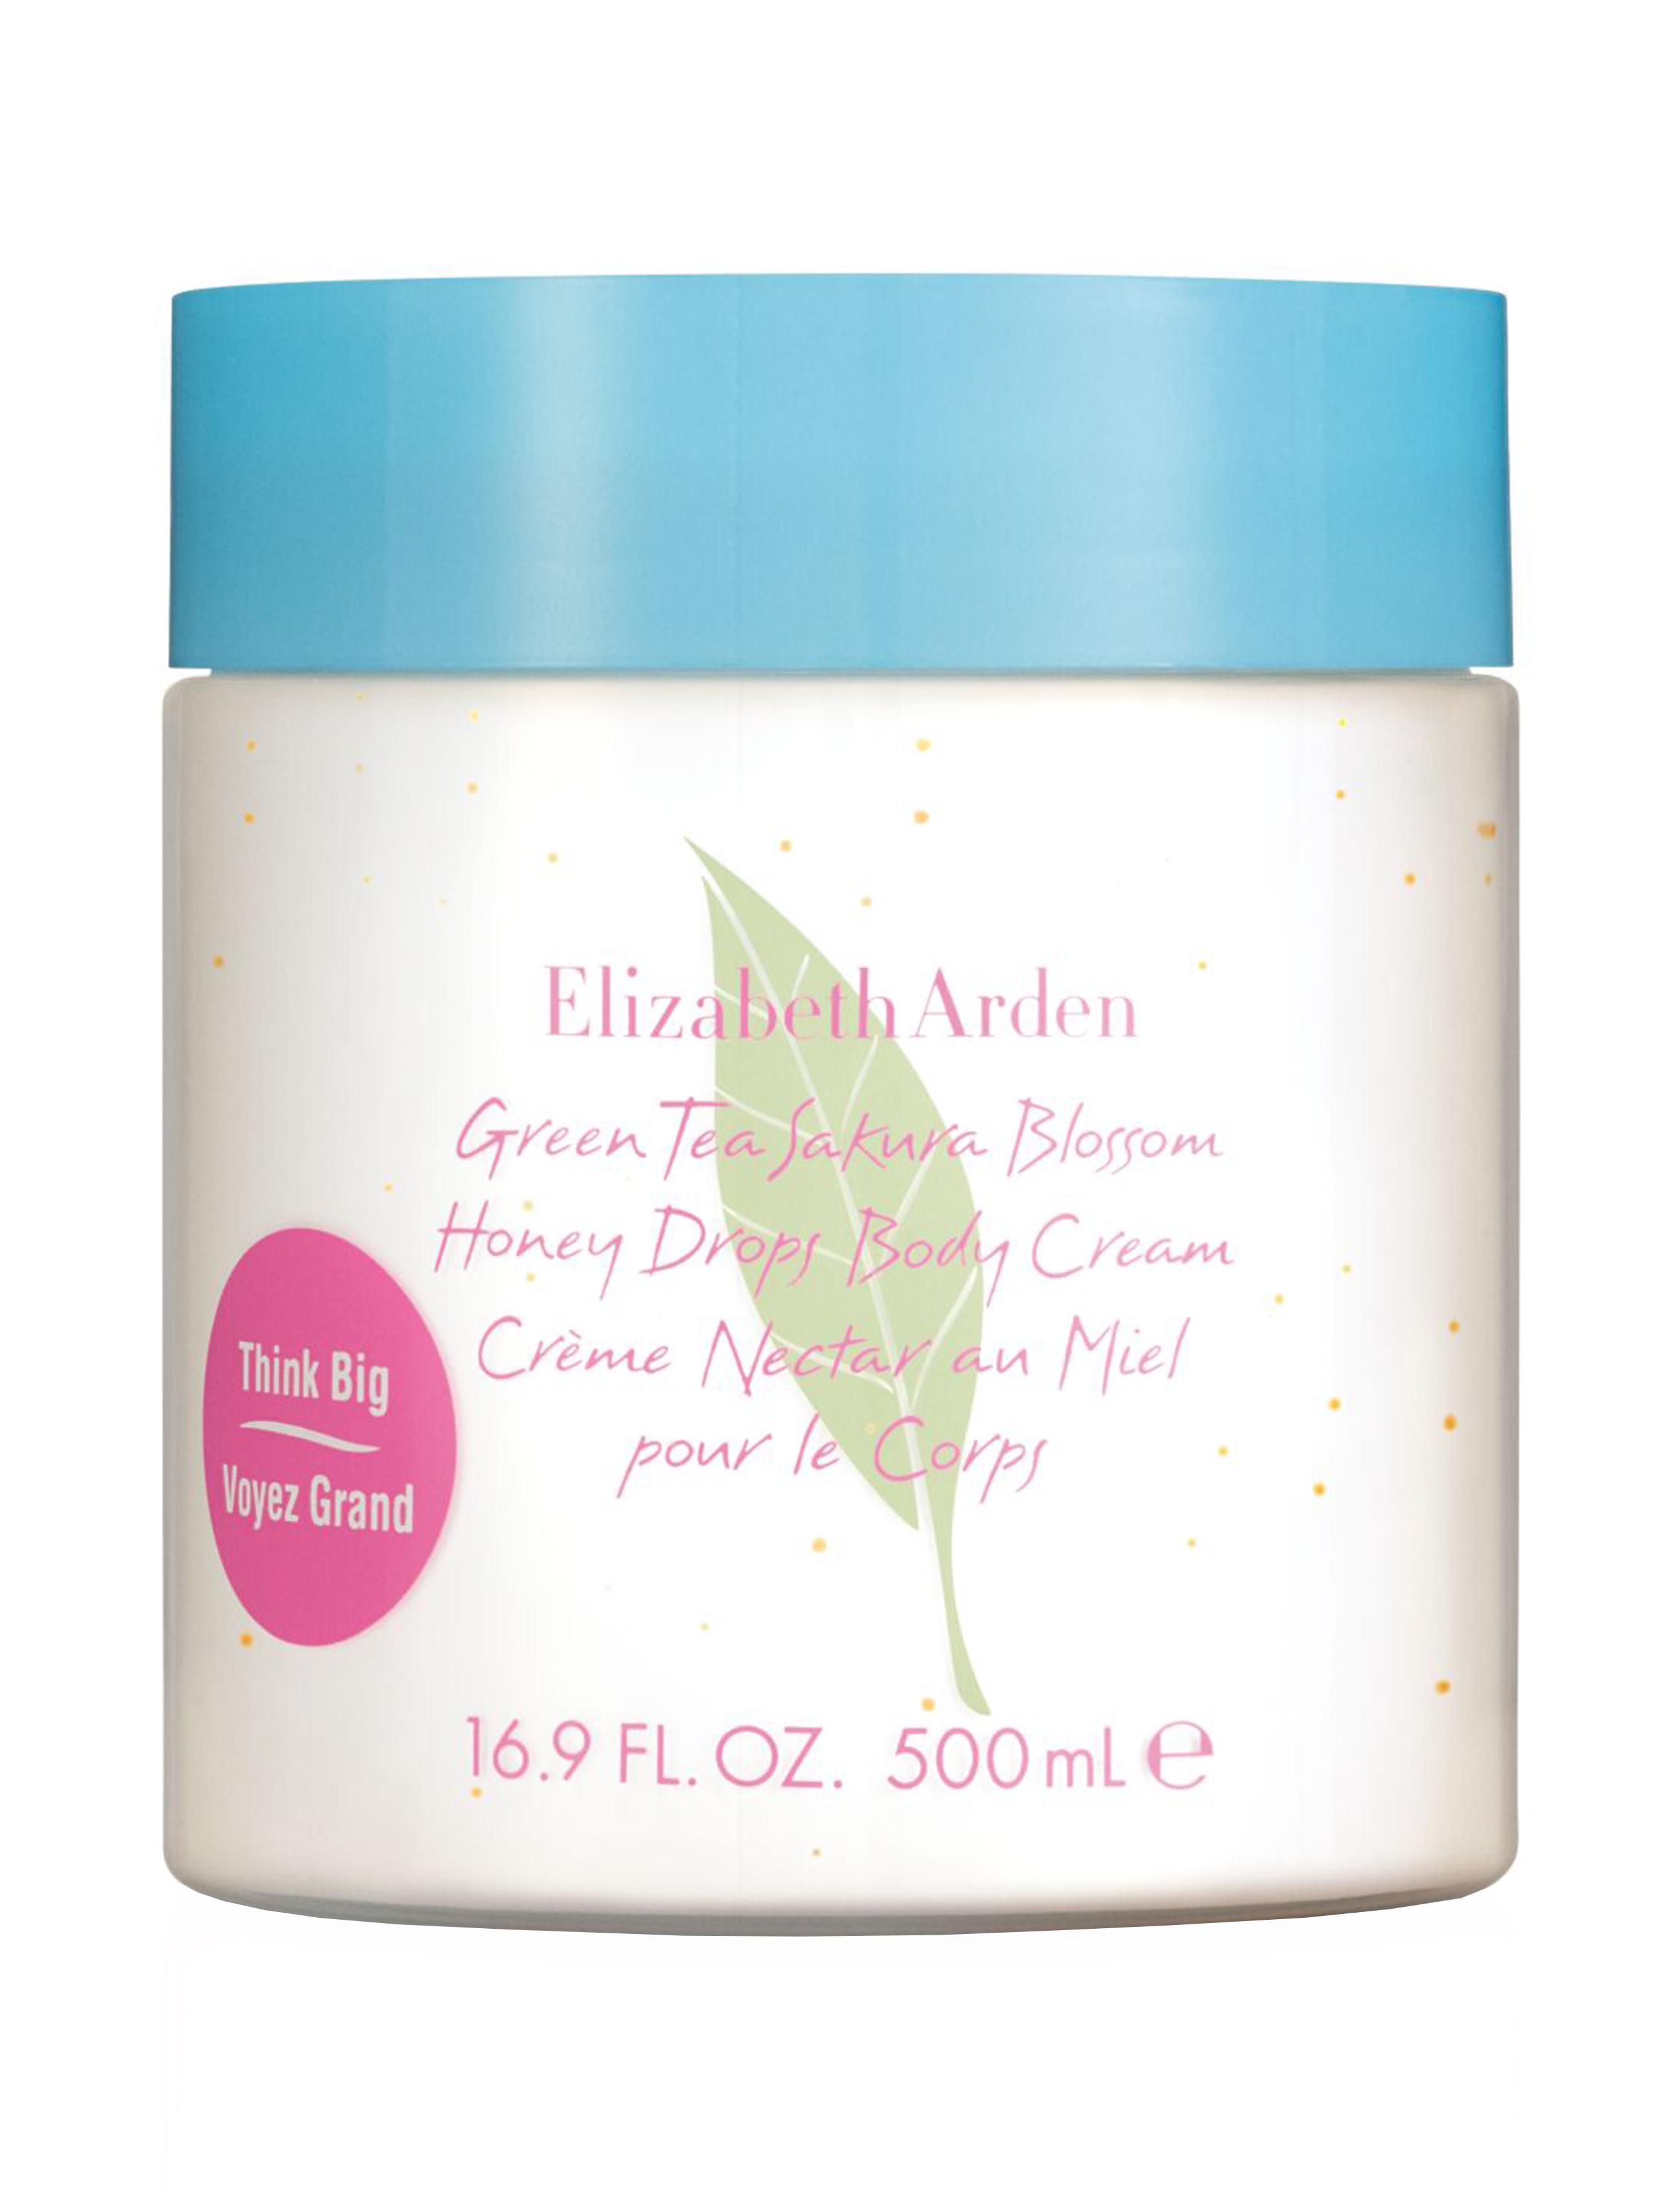 Elizabeth Arden Green Tea Sakura Blossom Honey Drops Body Cream